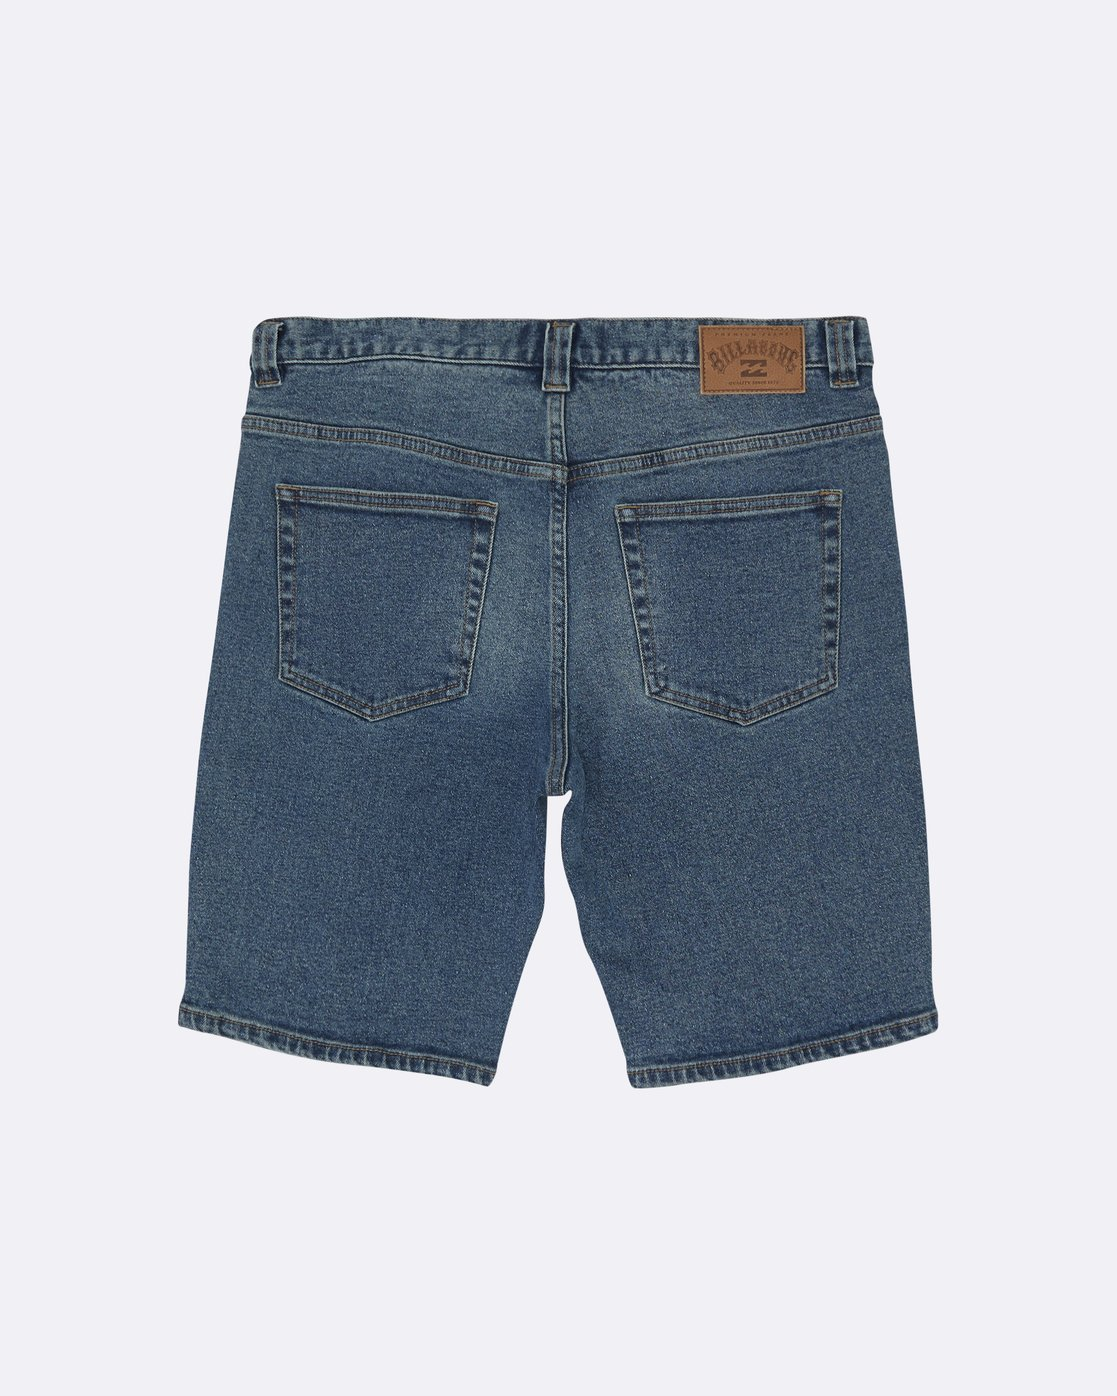 Outsider Denim 20 Pantalones Vaqueros Cortos Para Hombre S1wk31bip0 Billabong